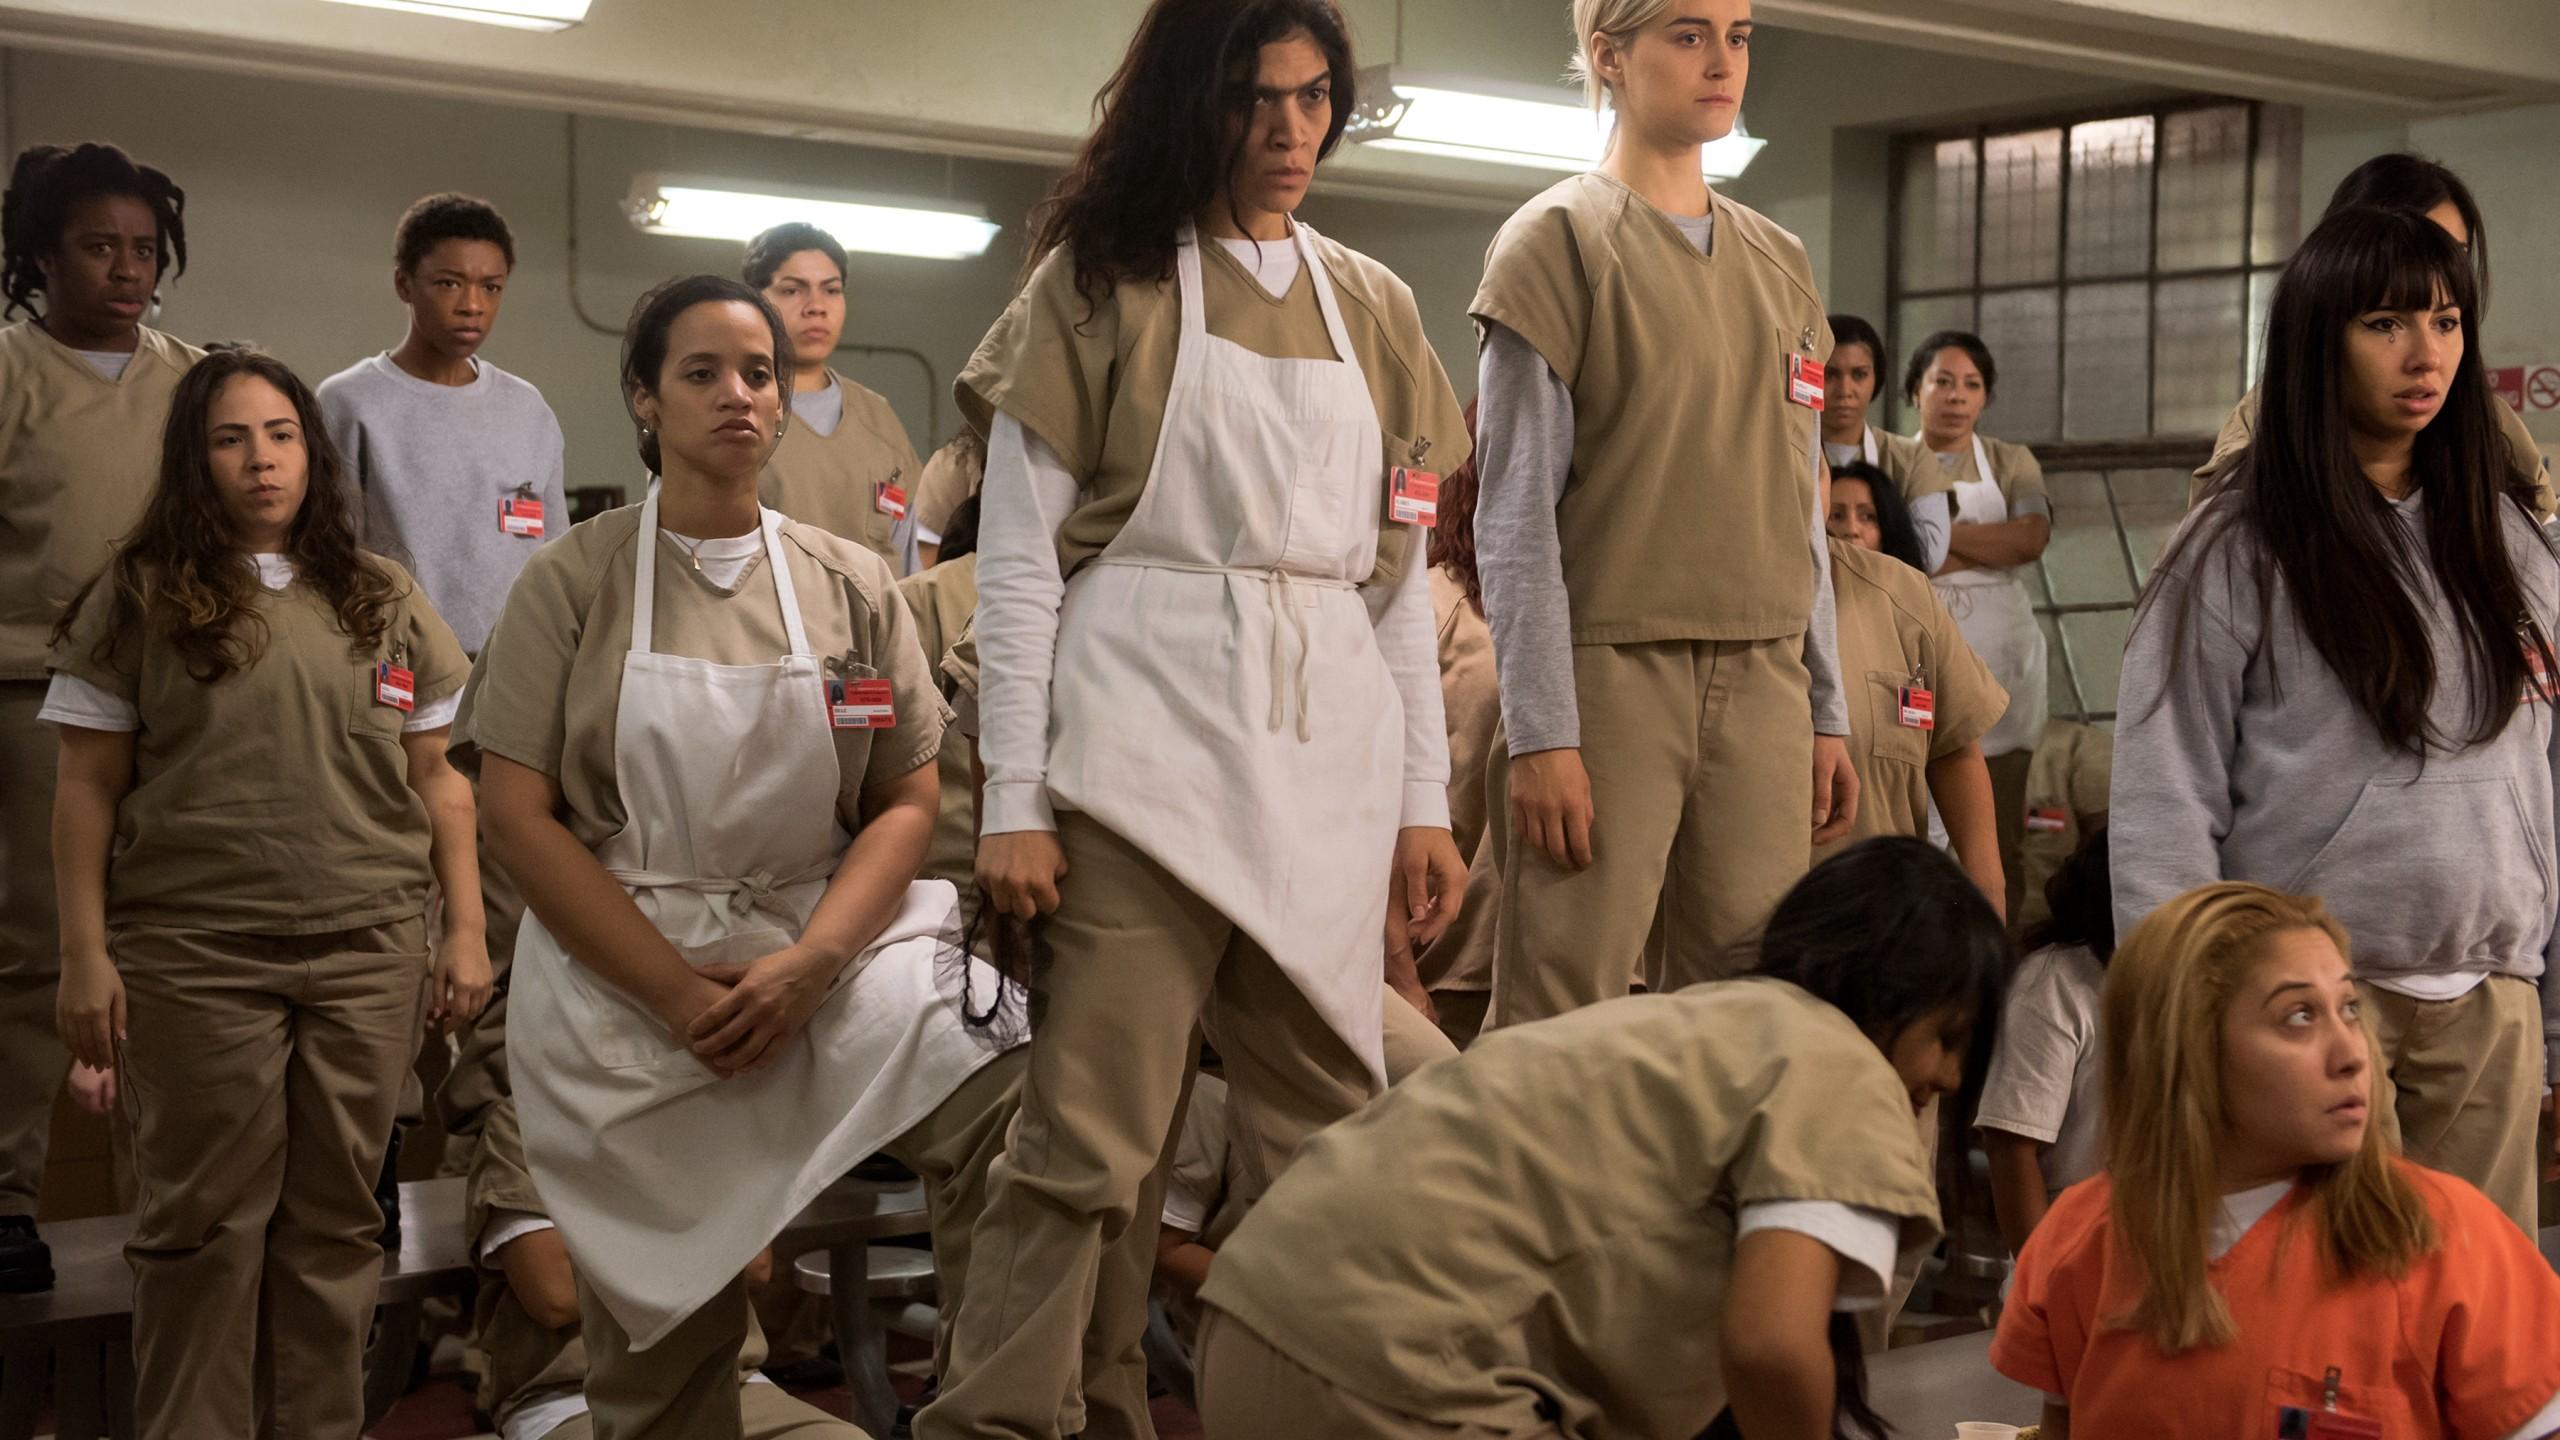 Wallpaper Orange Is The New Black Season 4 Prison Taylor Images, Photos, Reviews